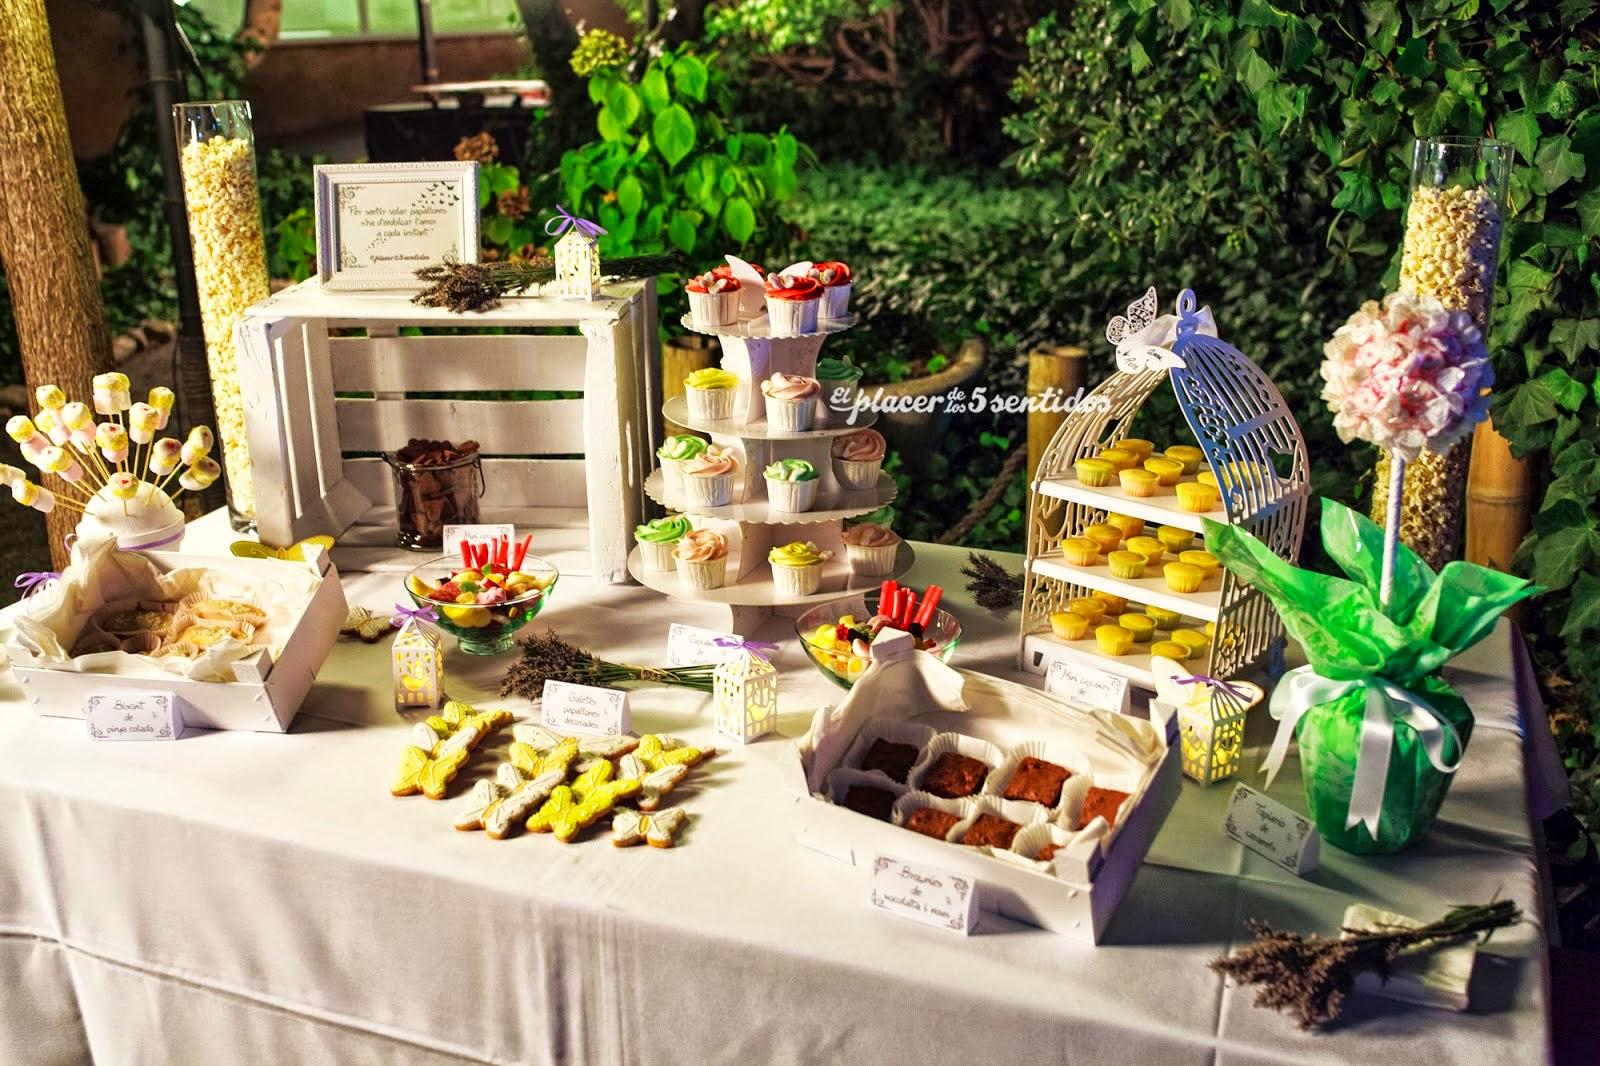 Dulce delirio octubre 2014 - Decoracion de mesa de dulces ...